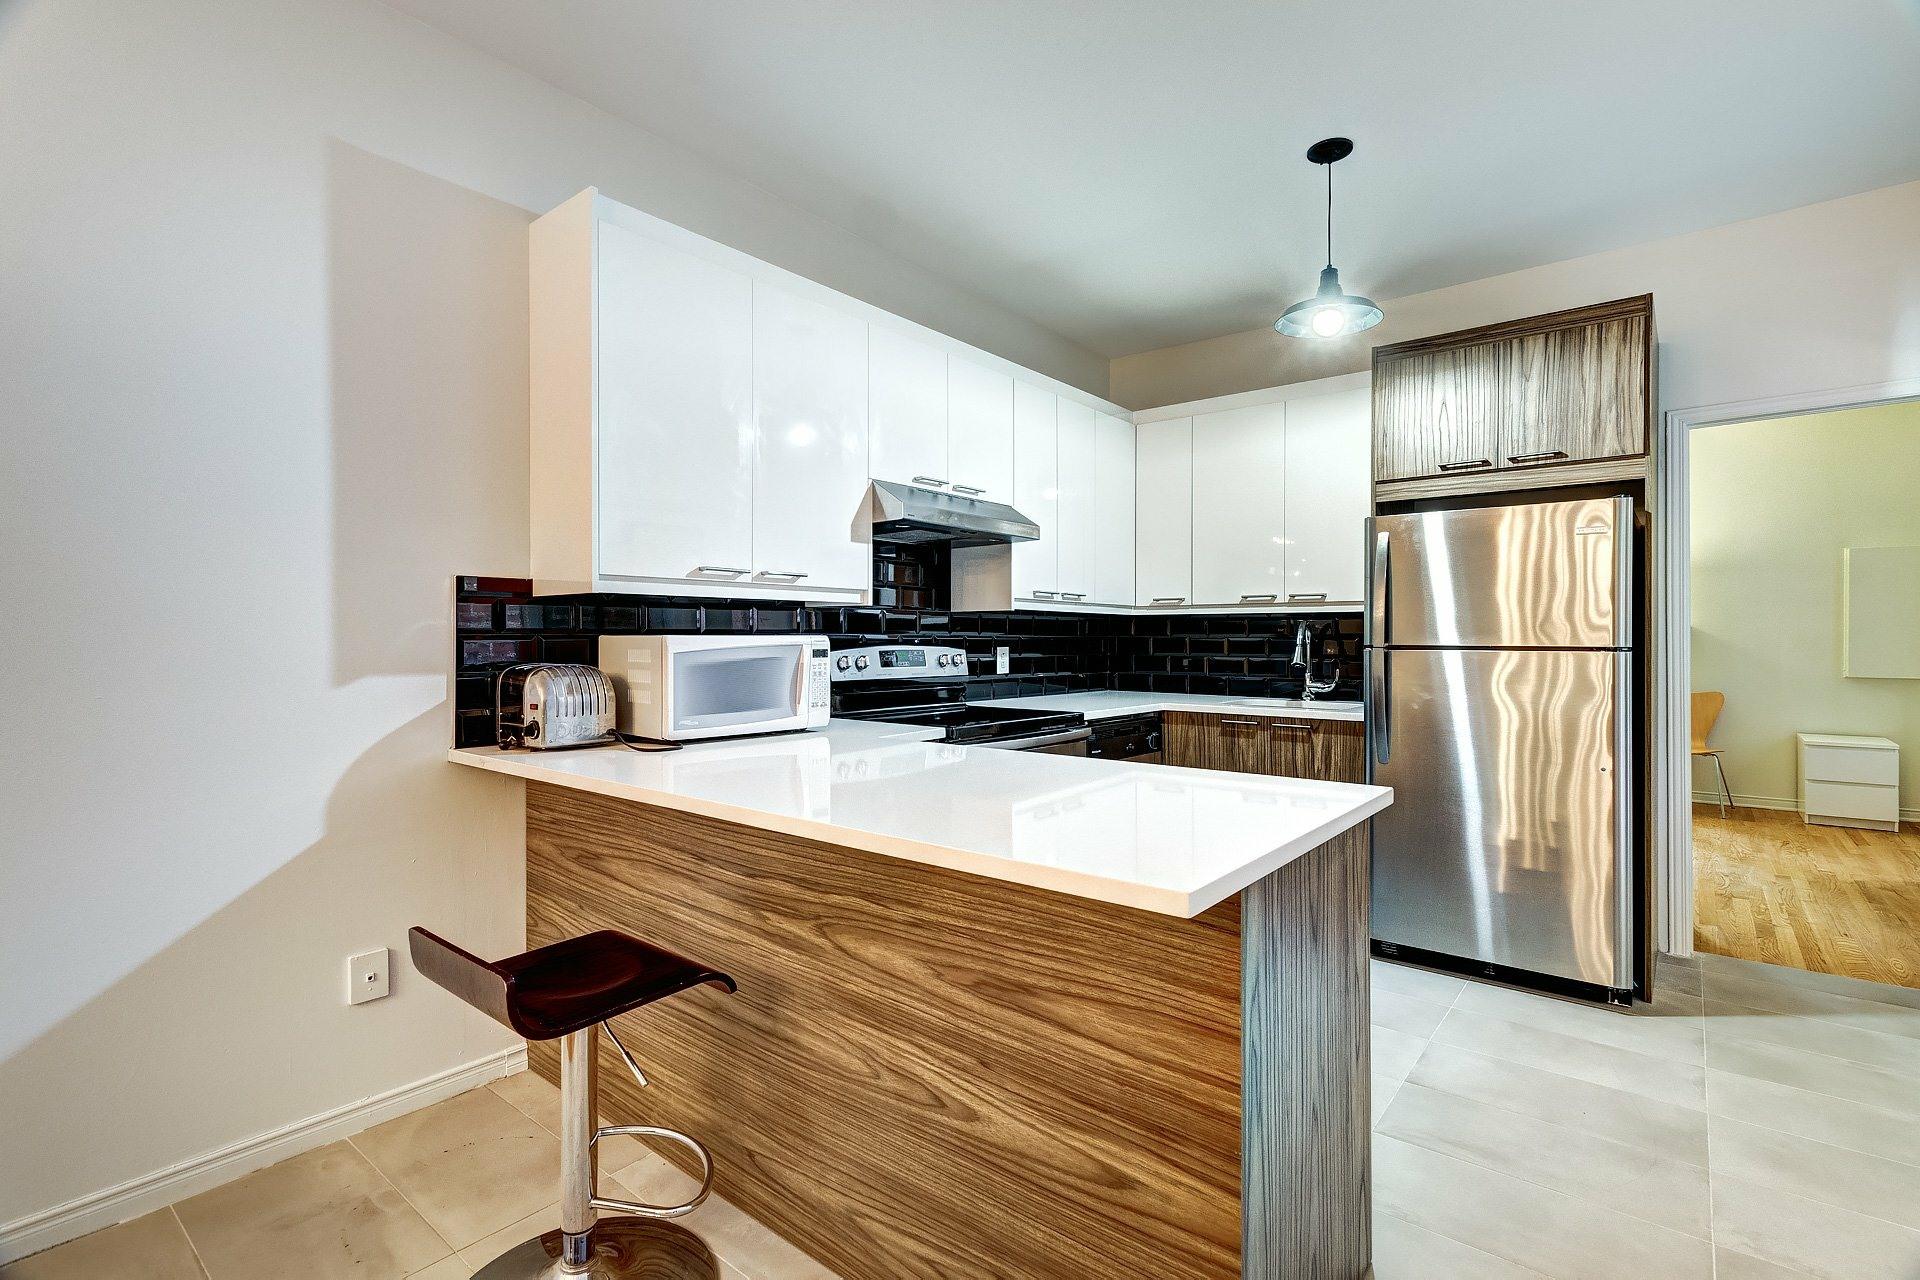 image 5 - Apartment For rent Outremont Montréal  - 5 rooms